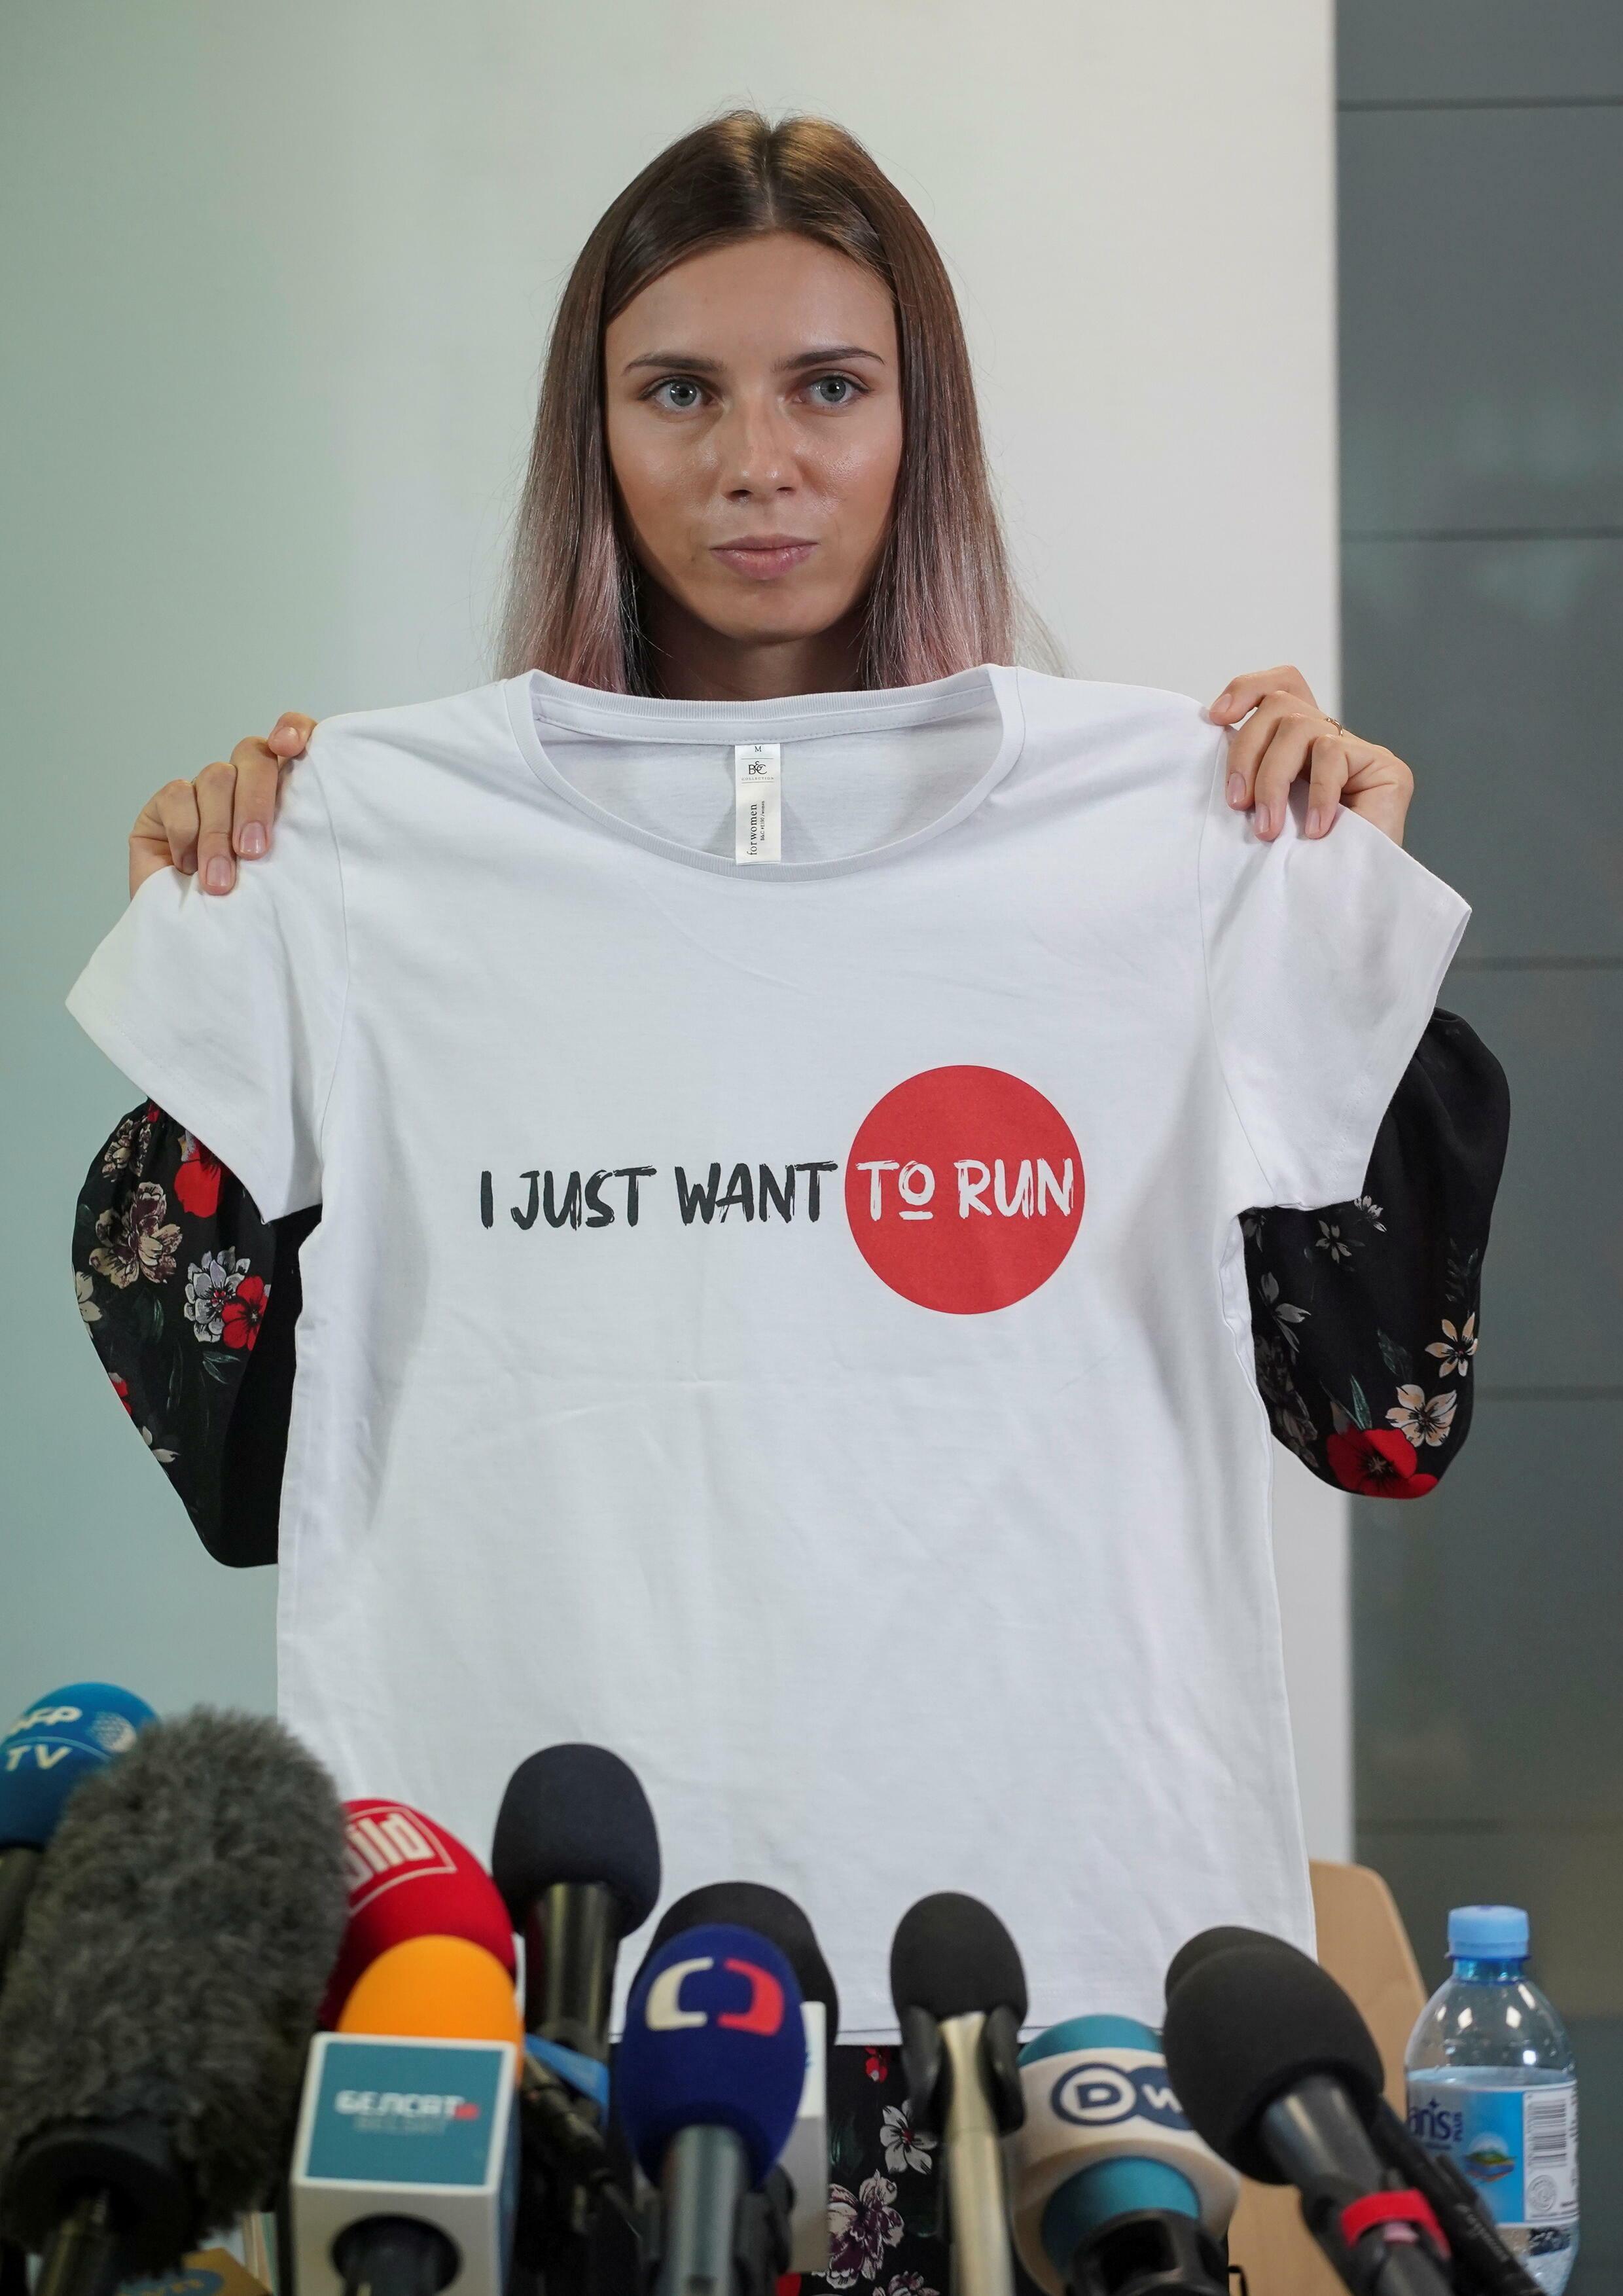 La sprinteuse biélorusse Krystsina Tsimanouskaya lors d'une conférence de presse à Varsovie en Pologne.